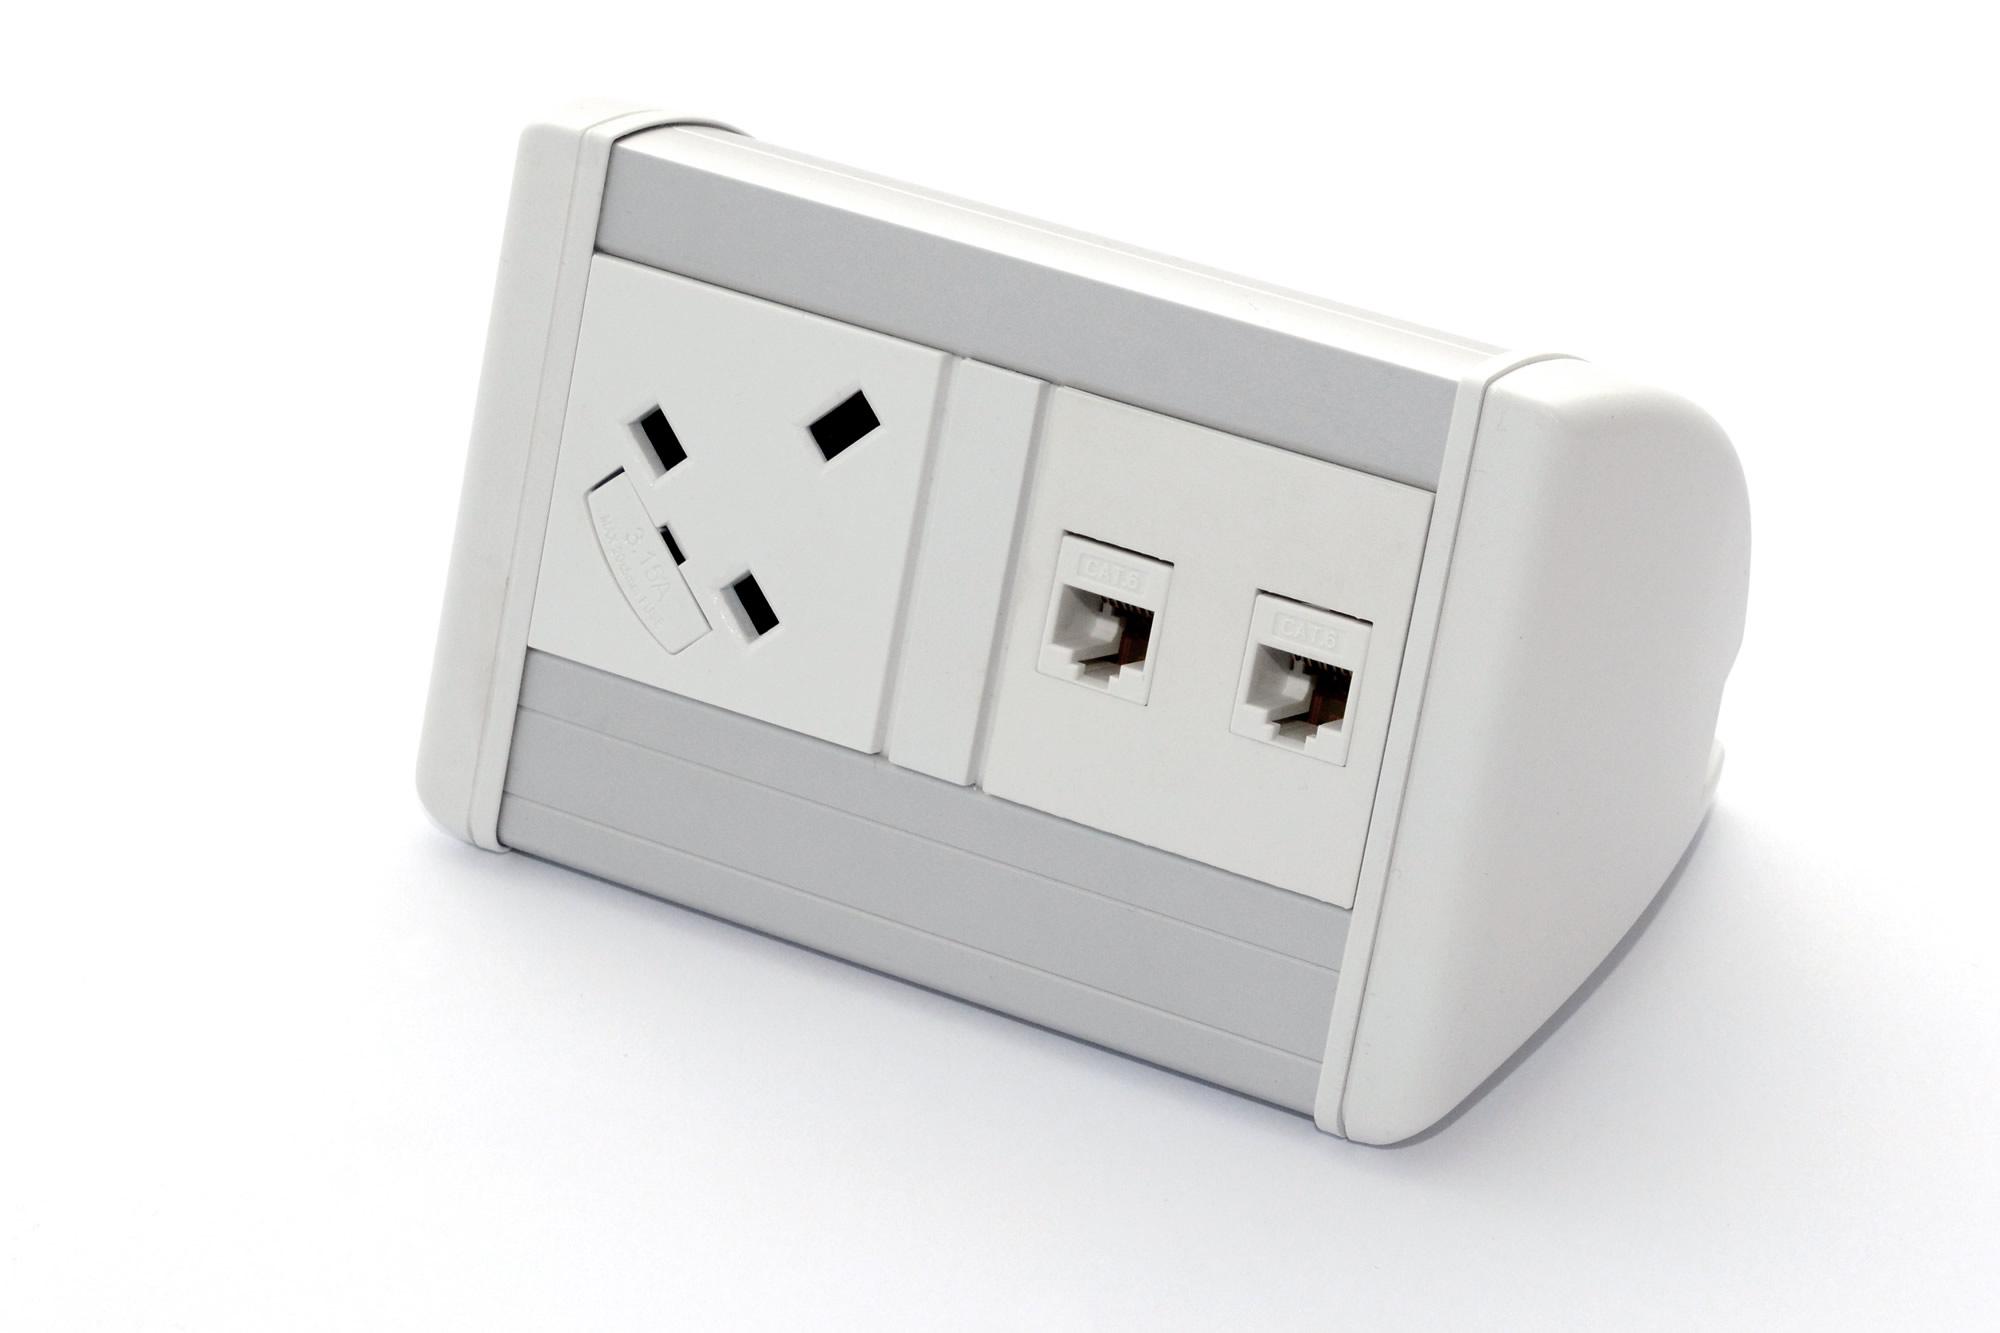 Harmony Power, USB Charging, Data & Media - CMD Ltd